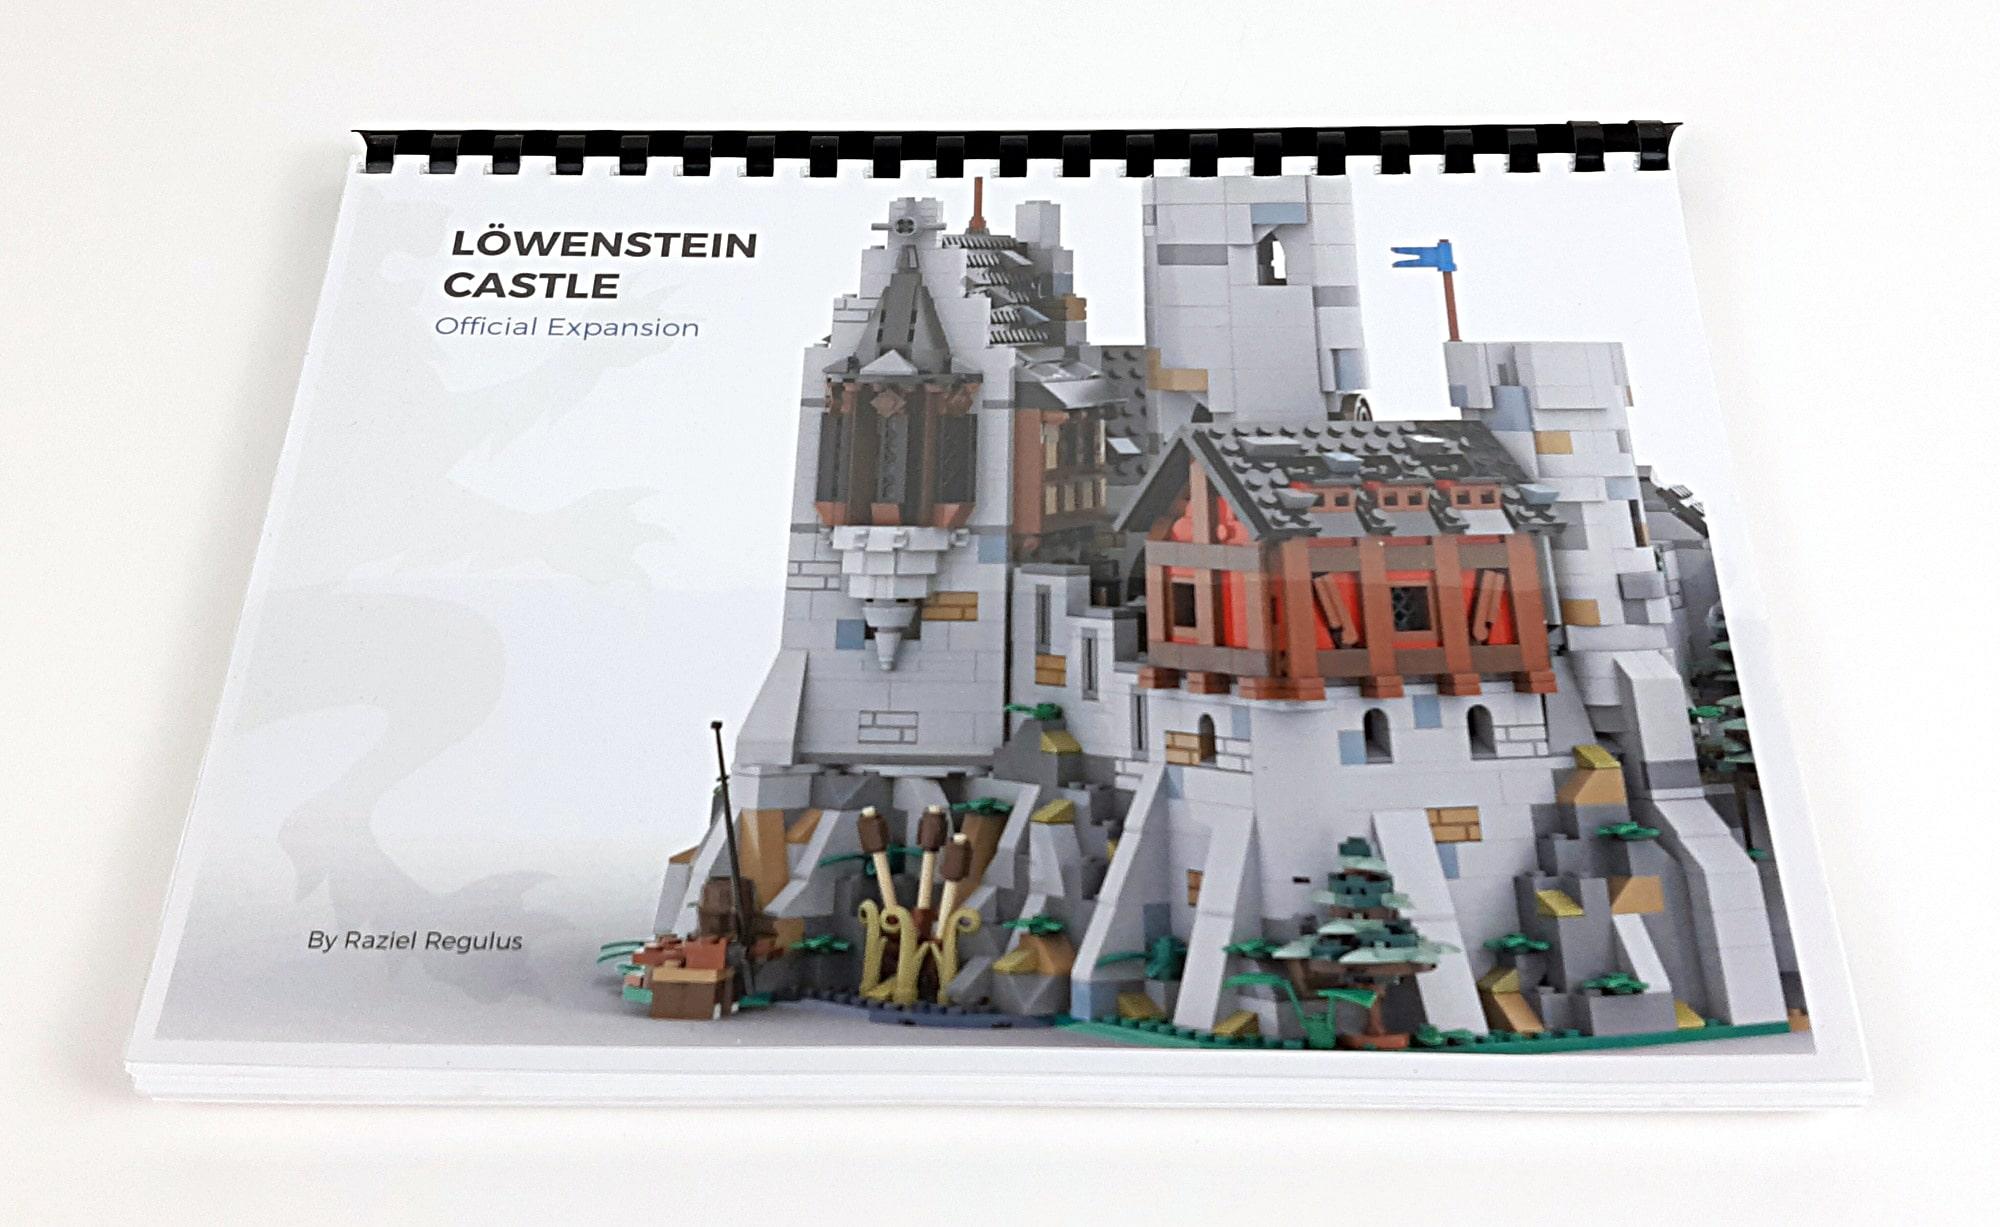 Bl19001 Castle Löwenstein Official Expansion Anletung 01